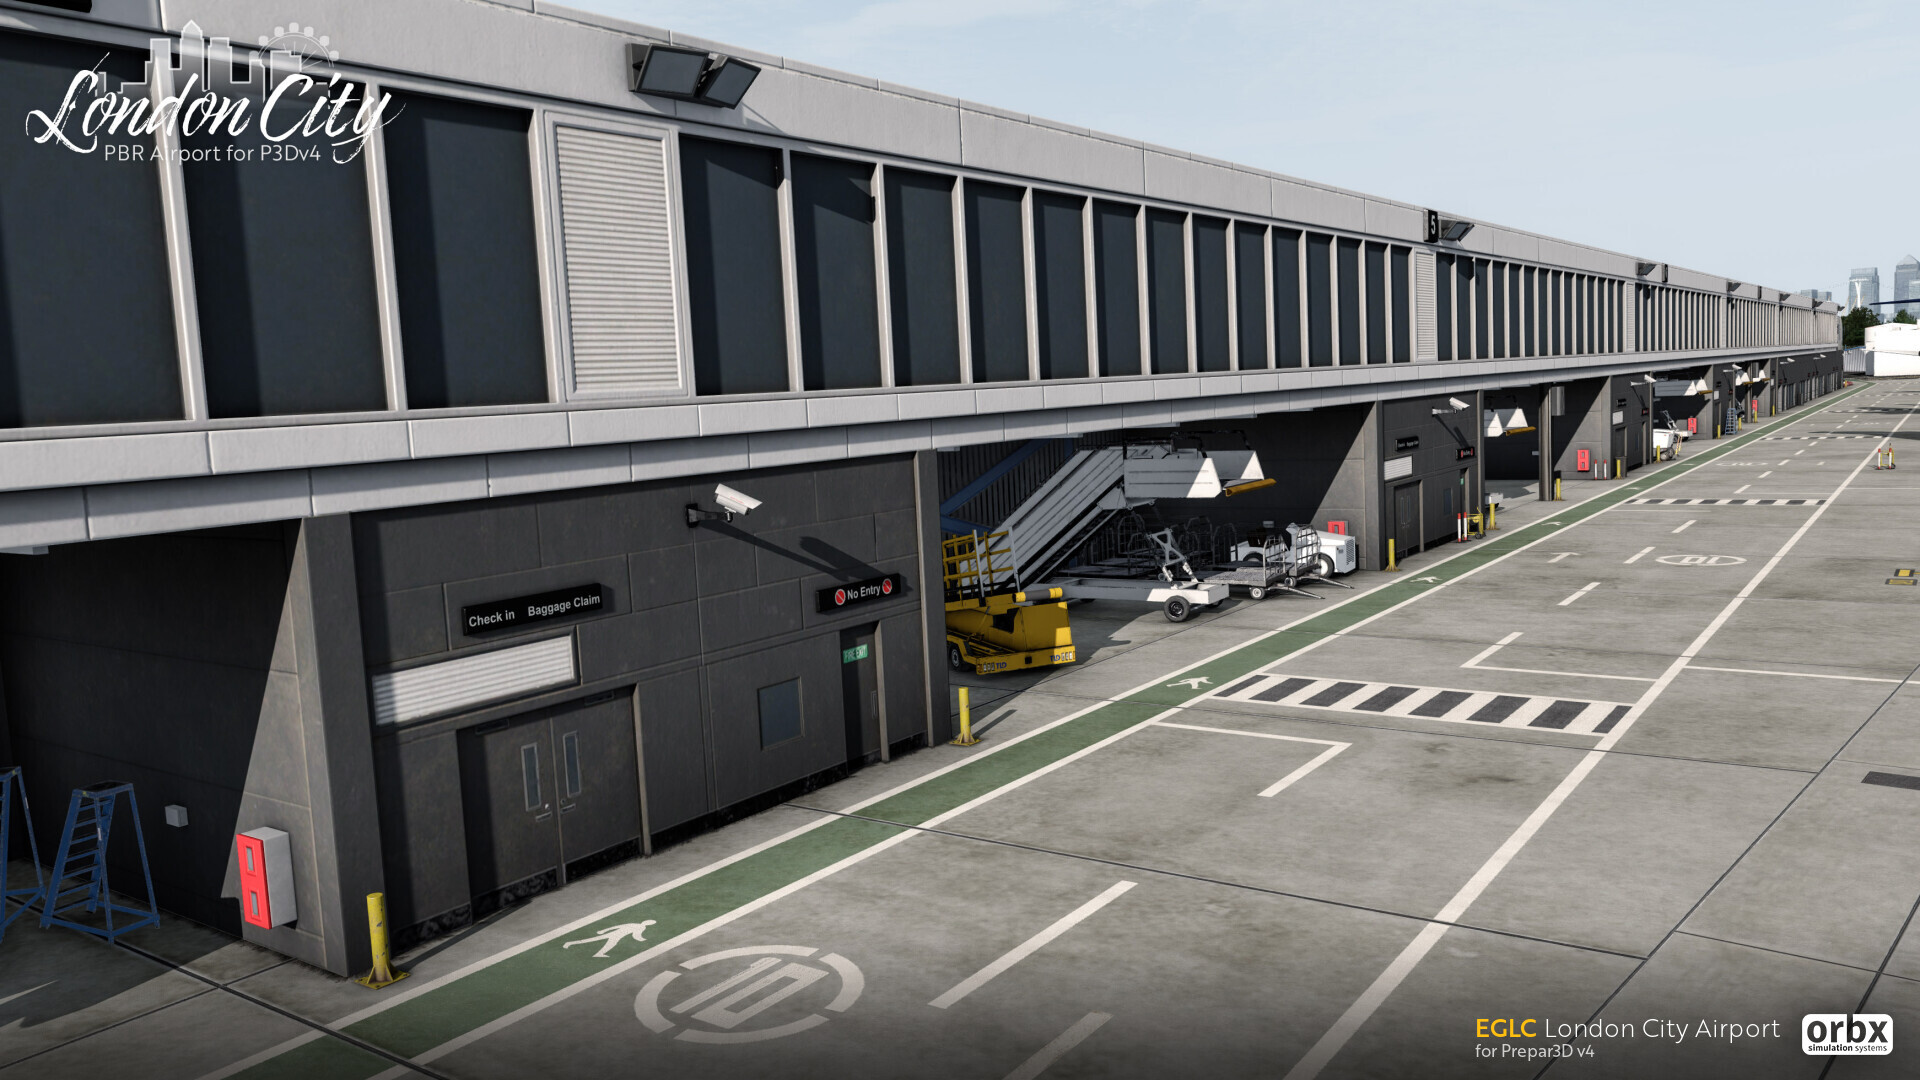 EGLC London City Airport